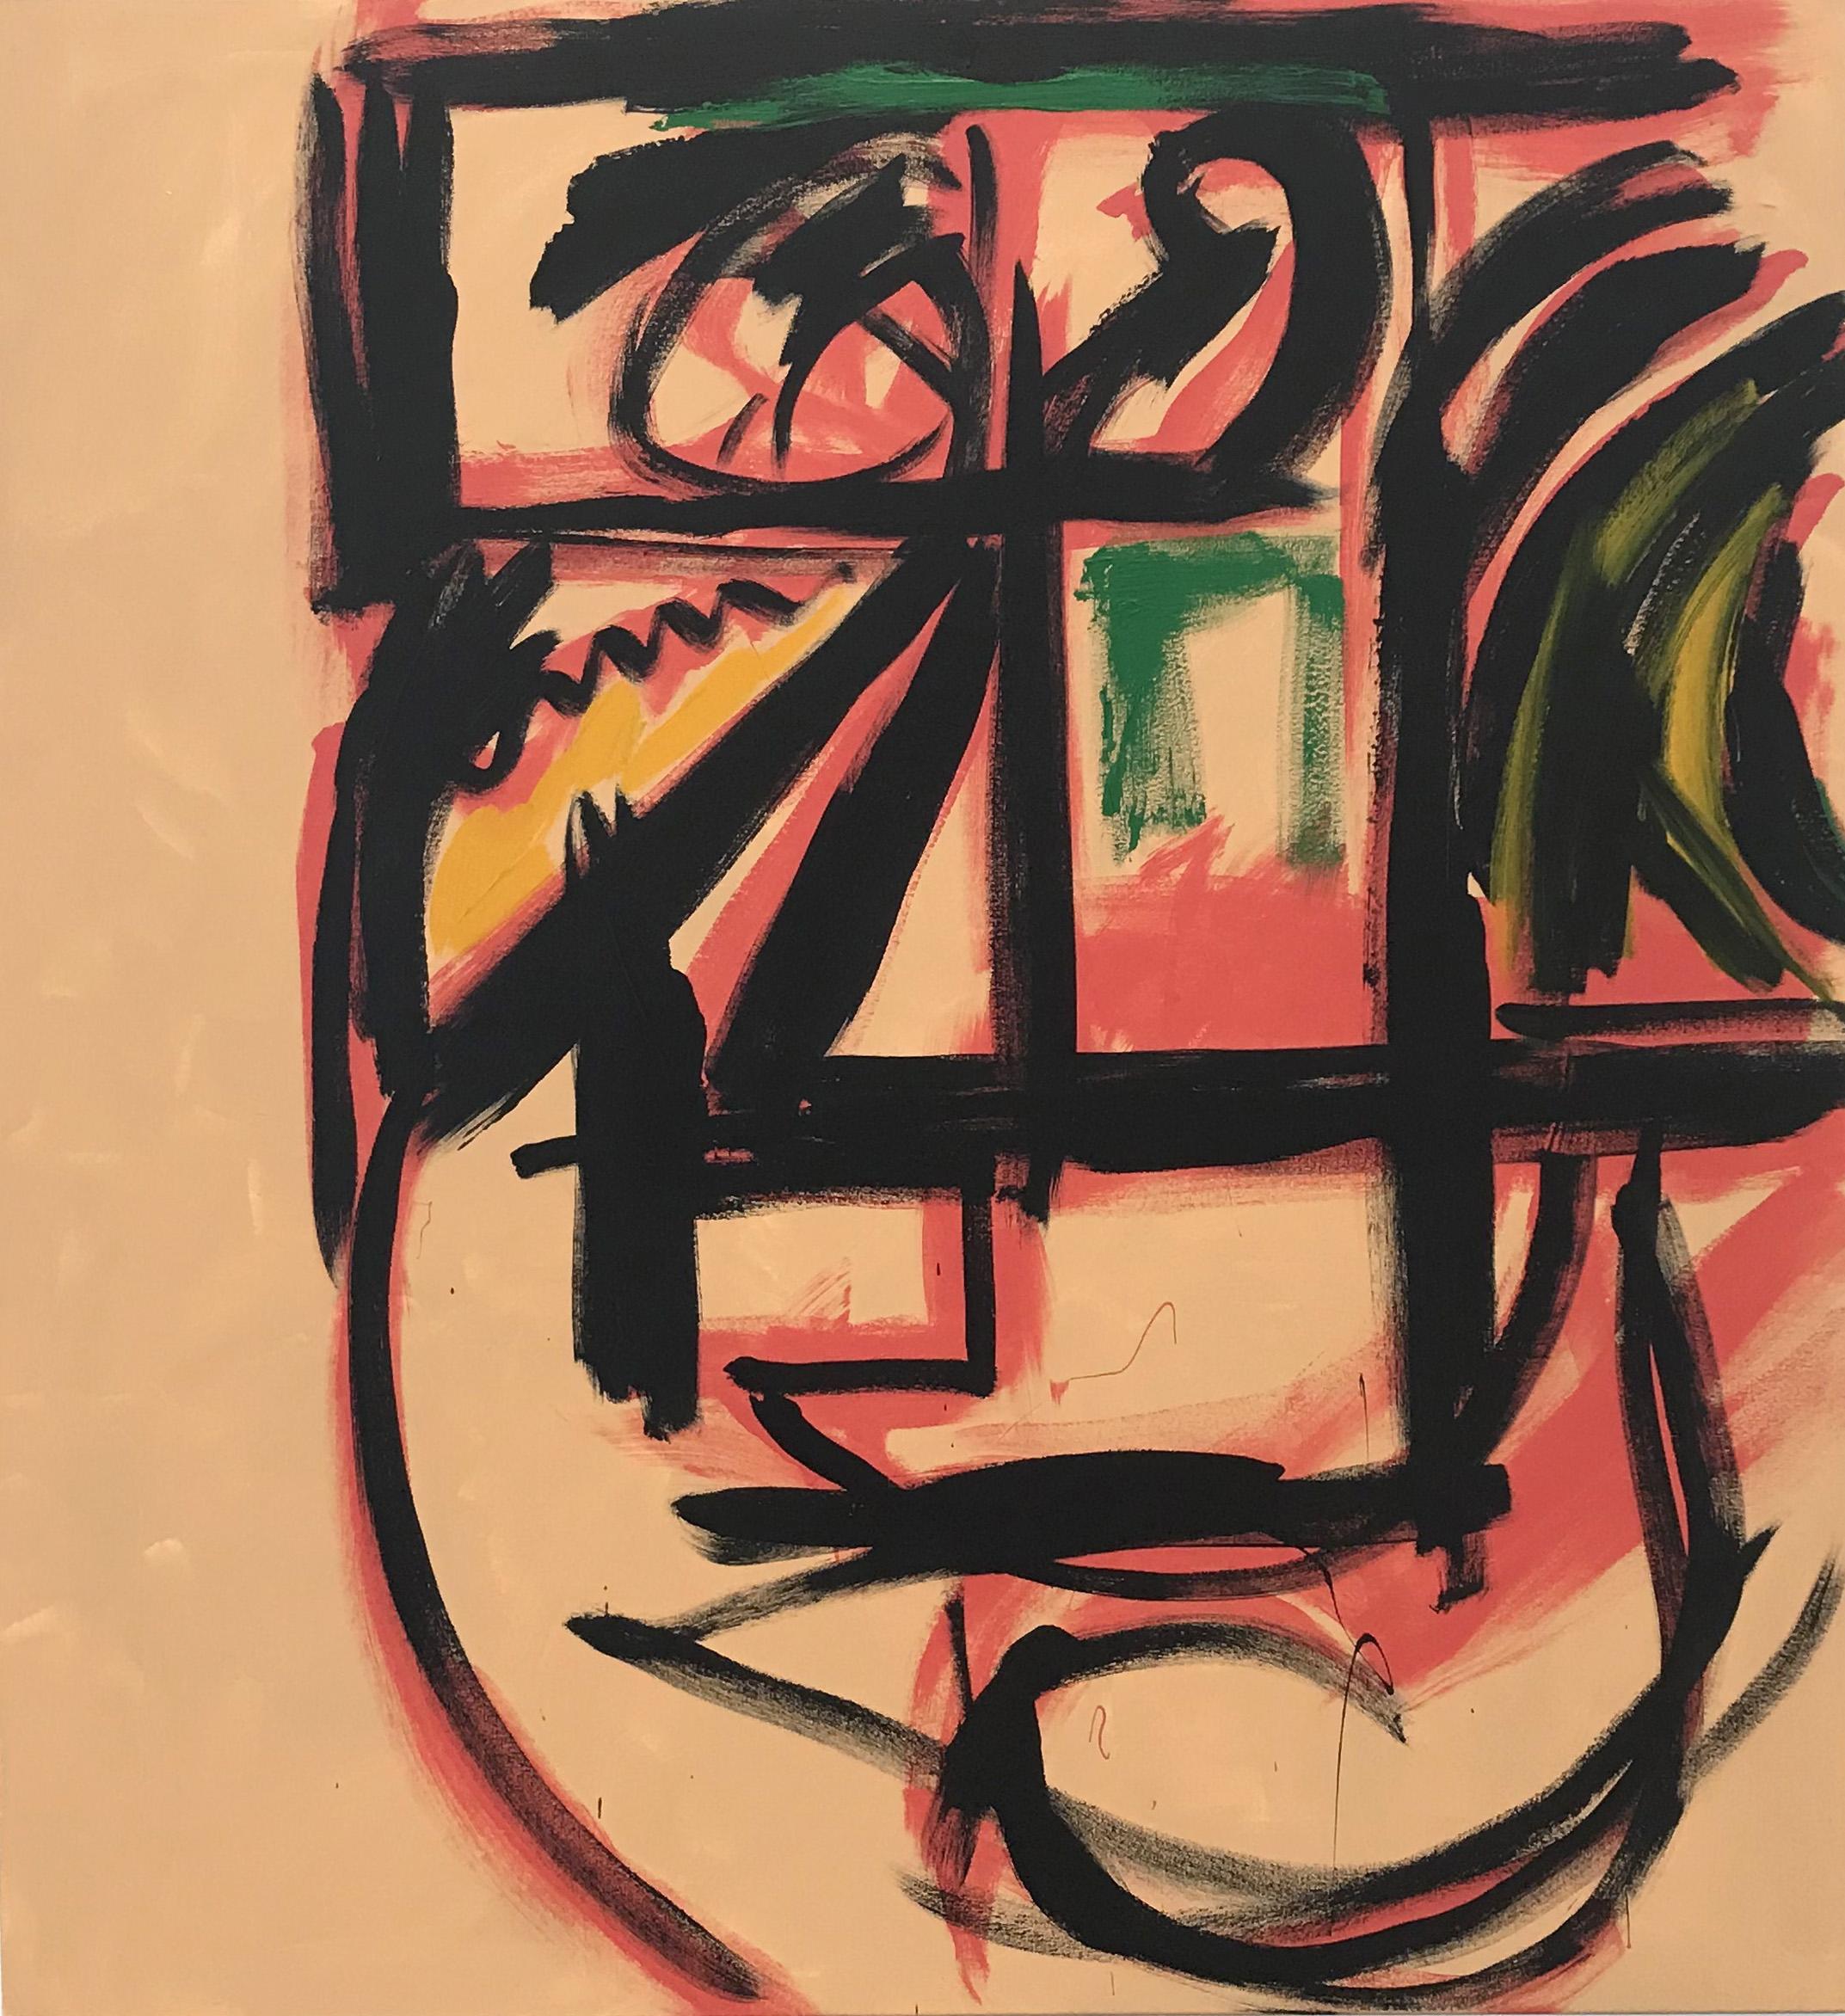 DICK WATKINS  Black Bay Shuffle , 2017 acrylic on canvas 167.5 x 152.5 cm